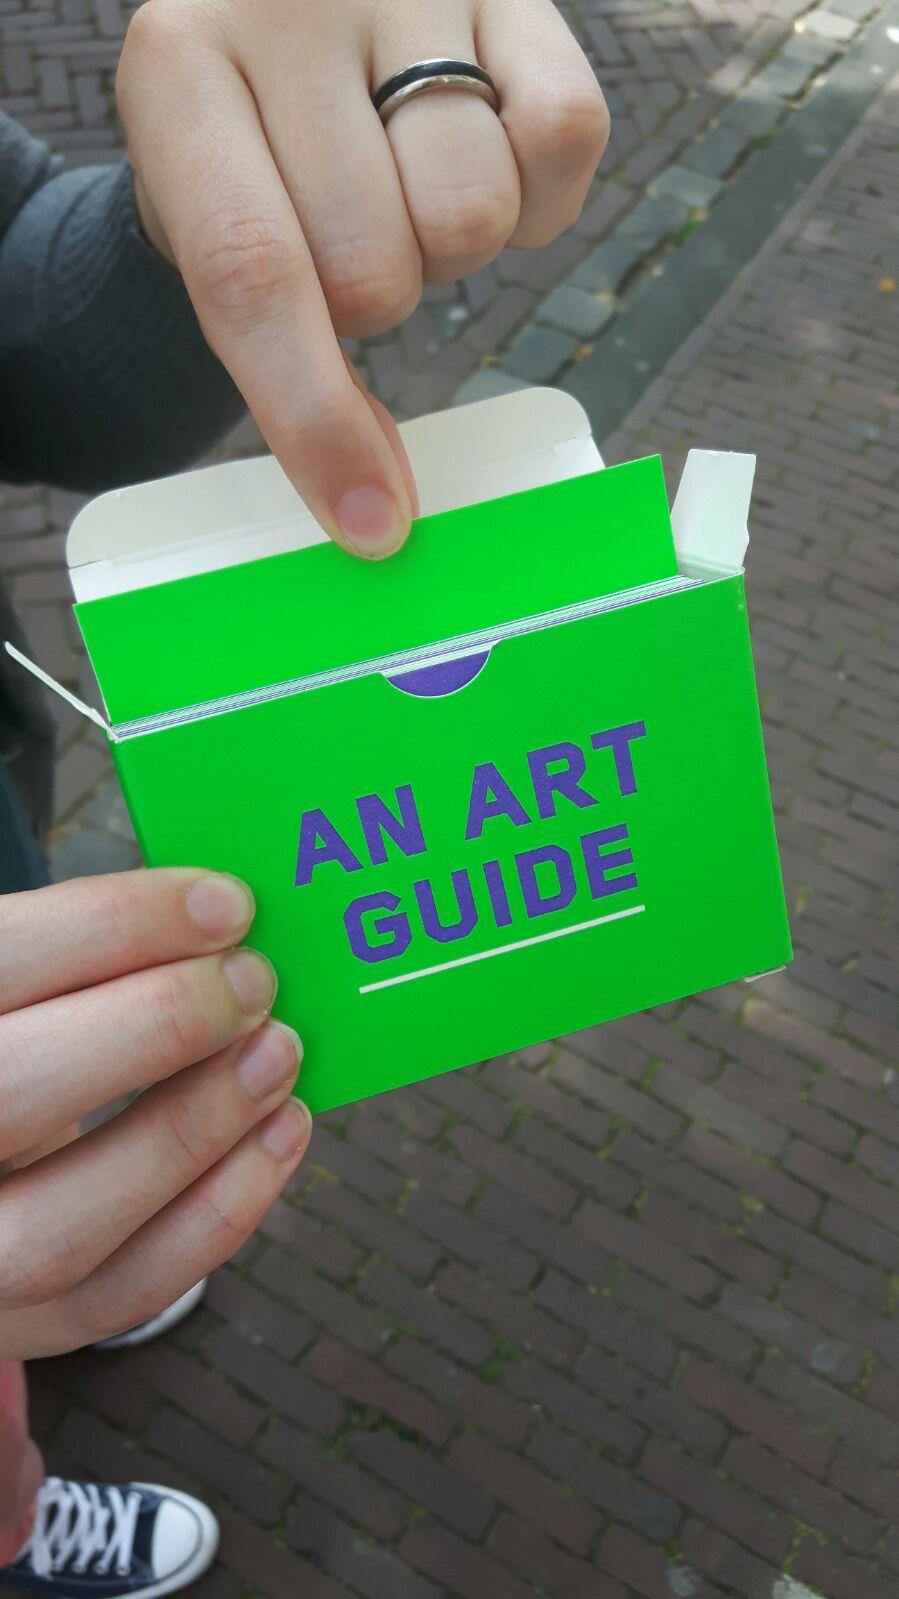 Anywhere An Art Guide - De Museumpodcast